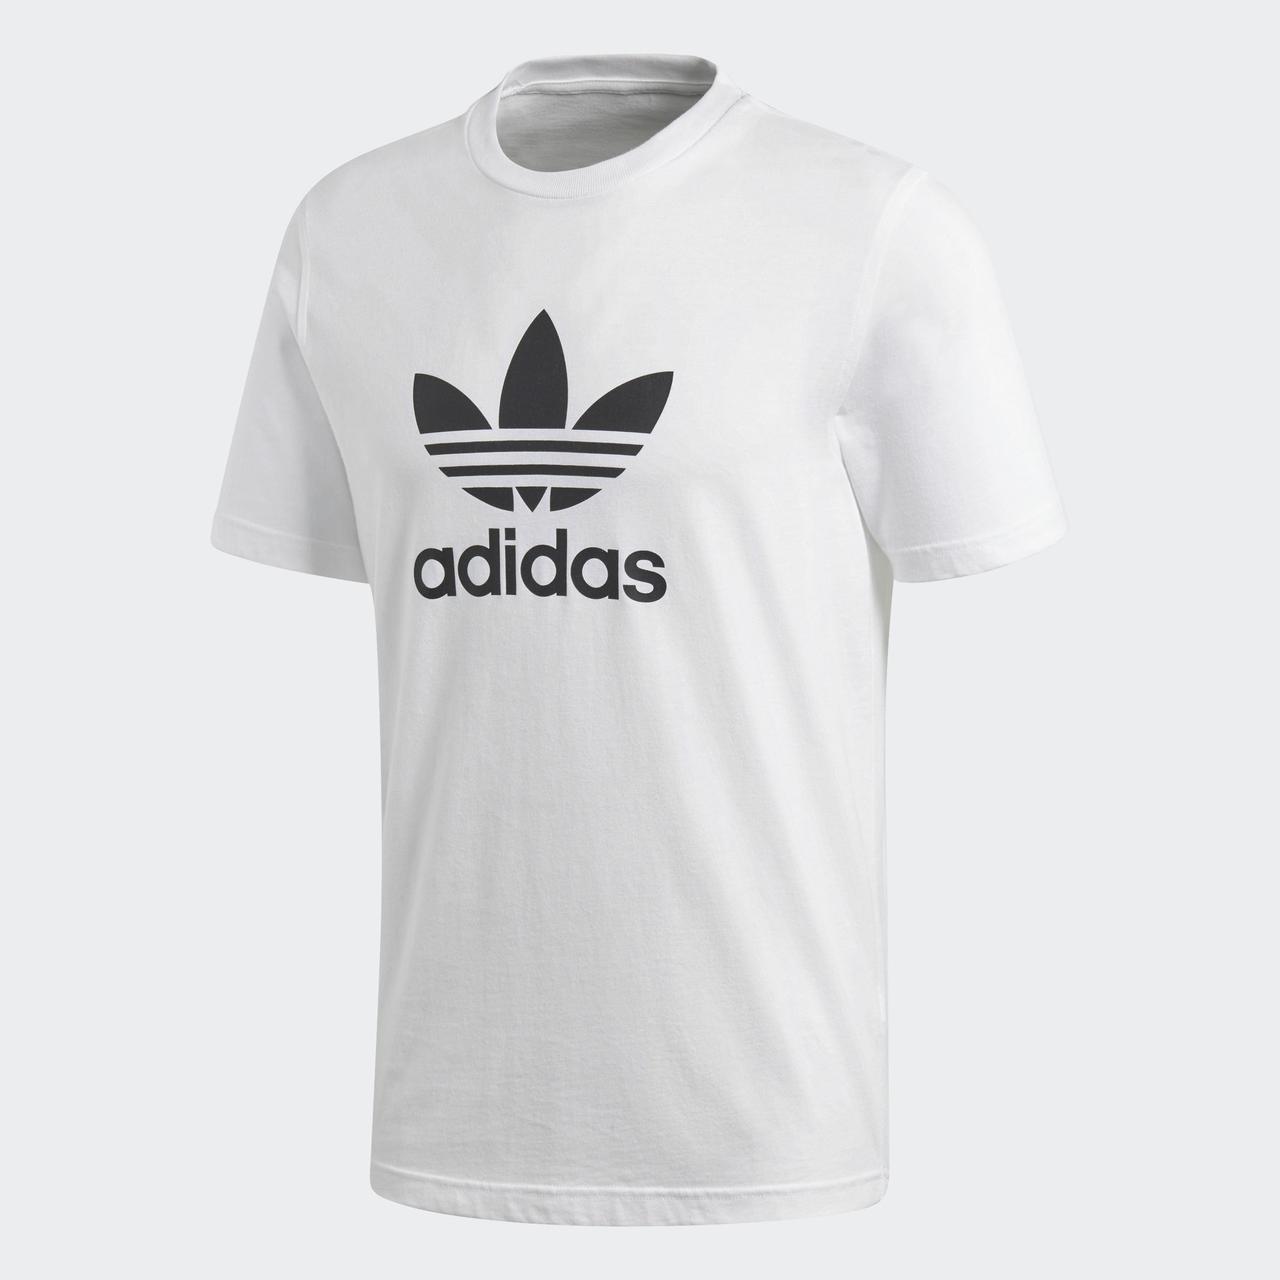 74ccb0d2 Мужская футболка Adidas Originals Trefoil (Артикул: CW0710) -  Интернет-магазин «Эксперт